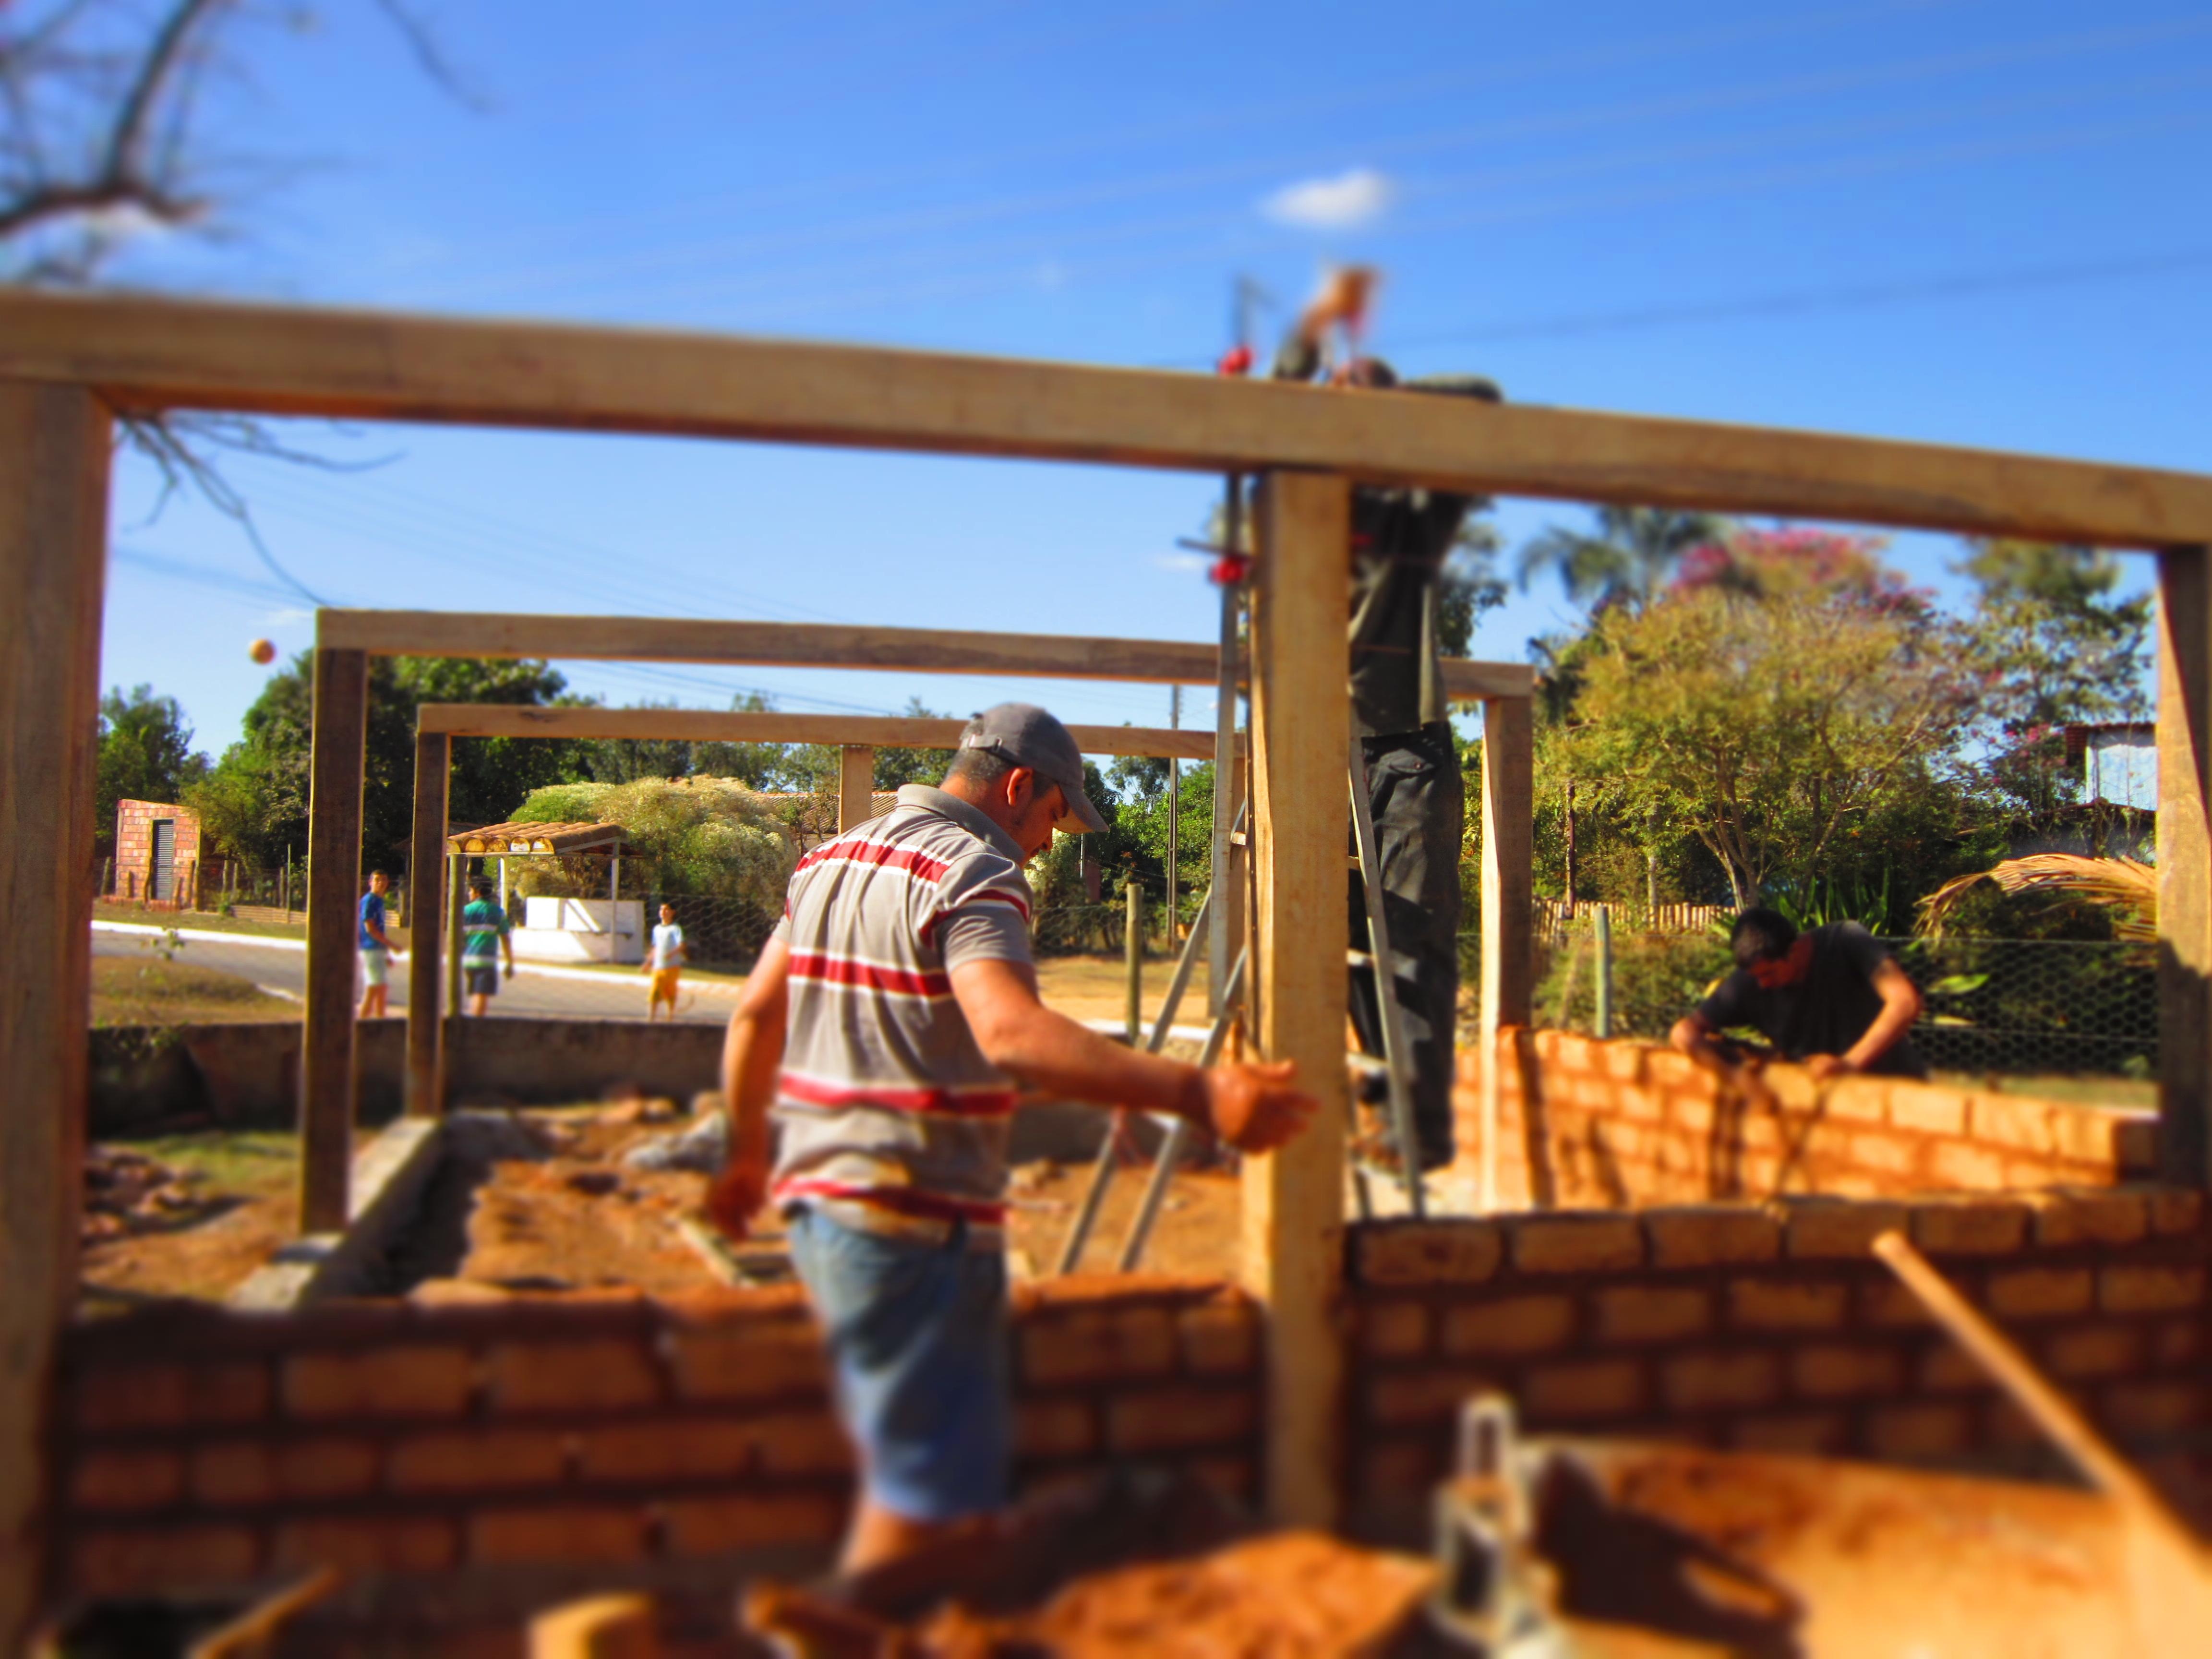 Levantando a estrutura de madeira